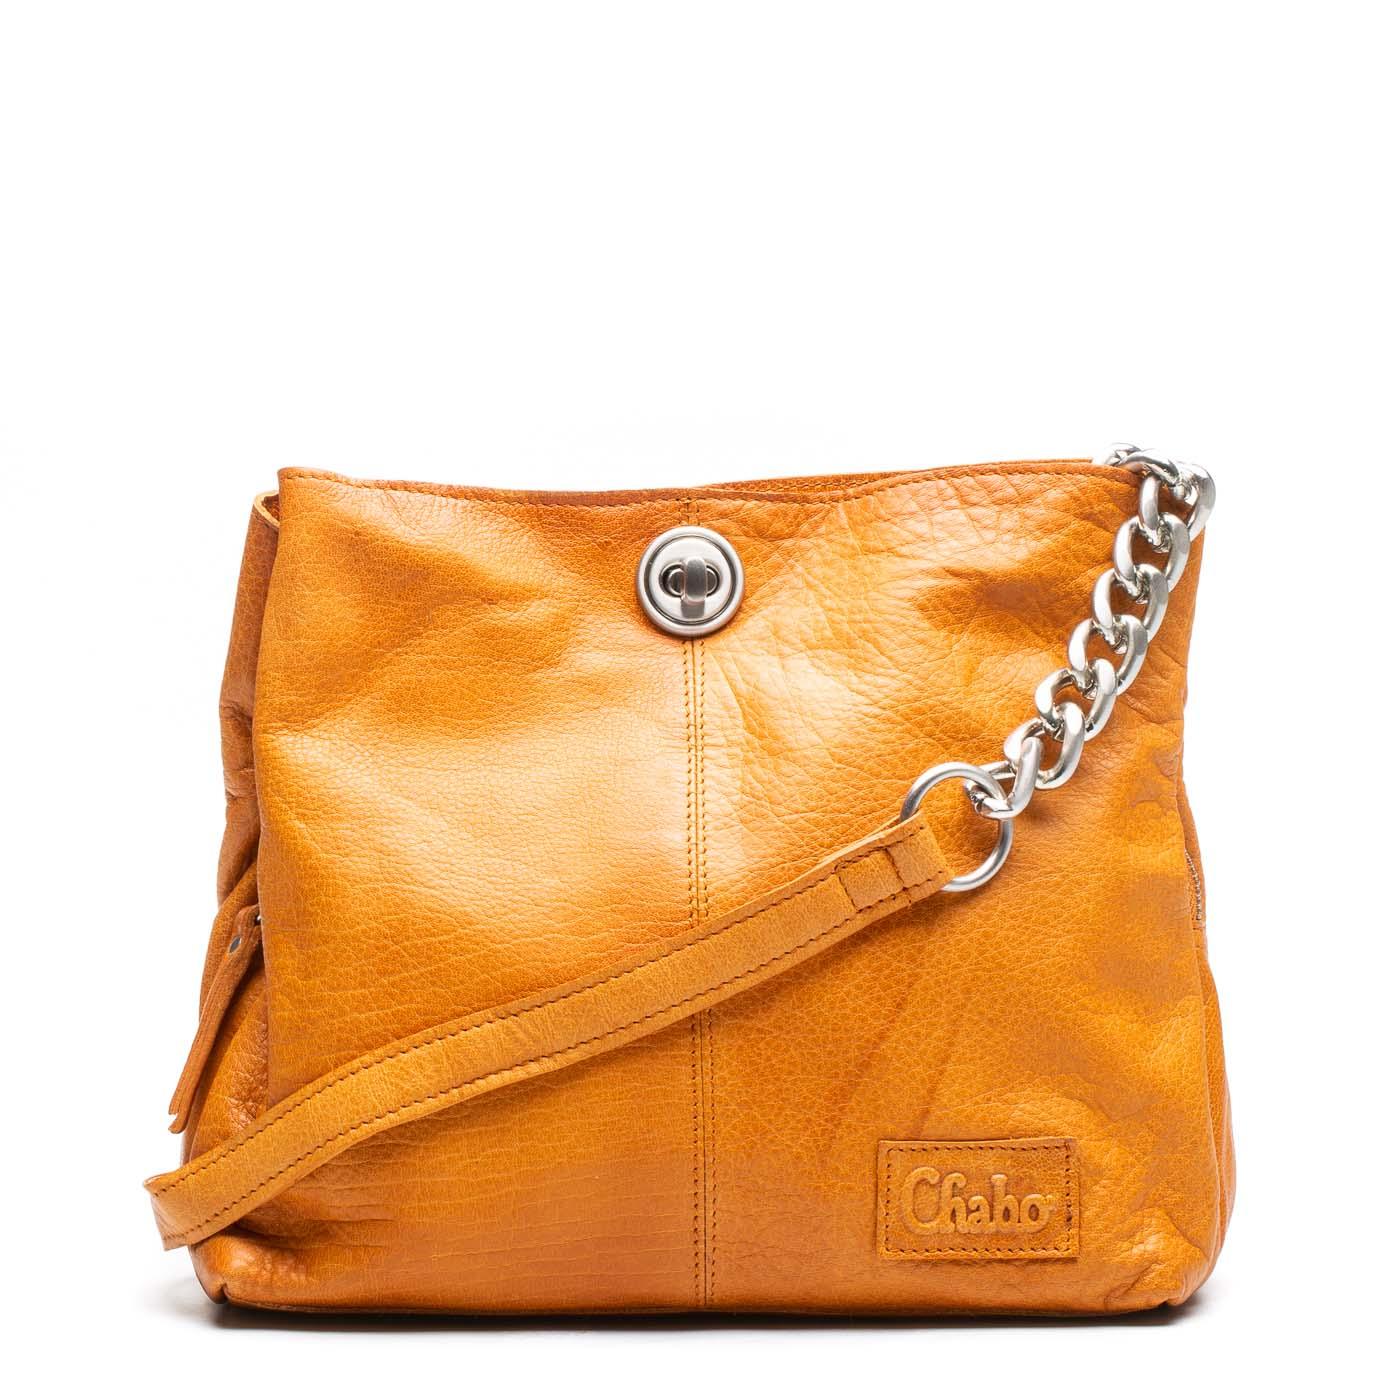 Chabo Bags Chain sac besace 8719274534112